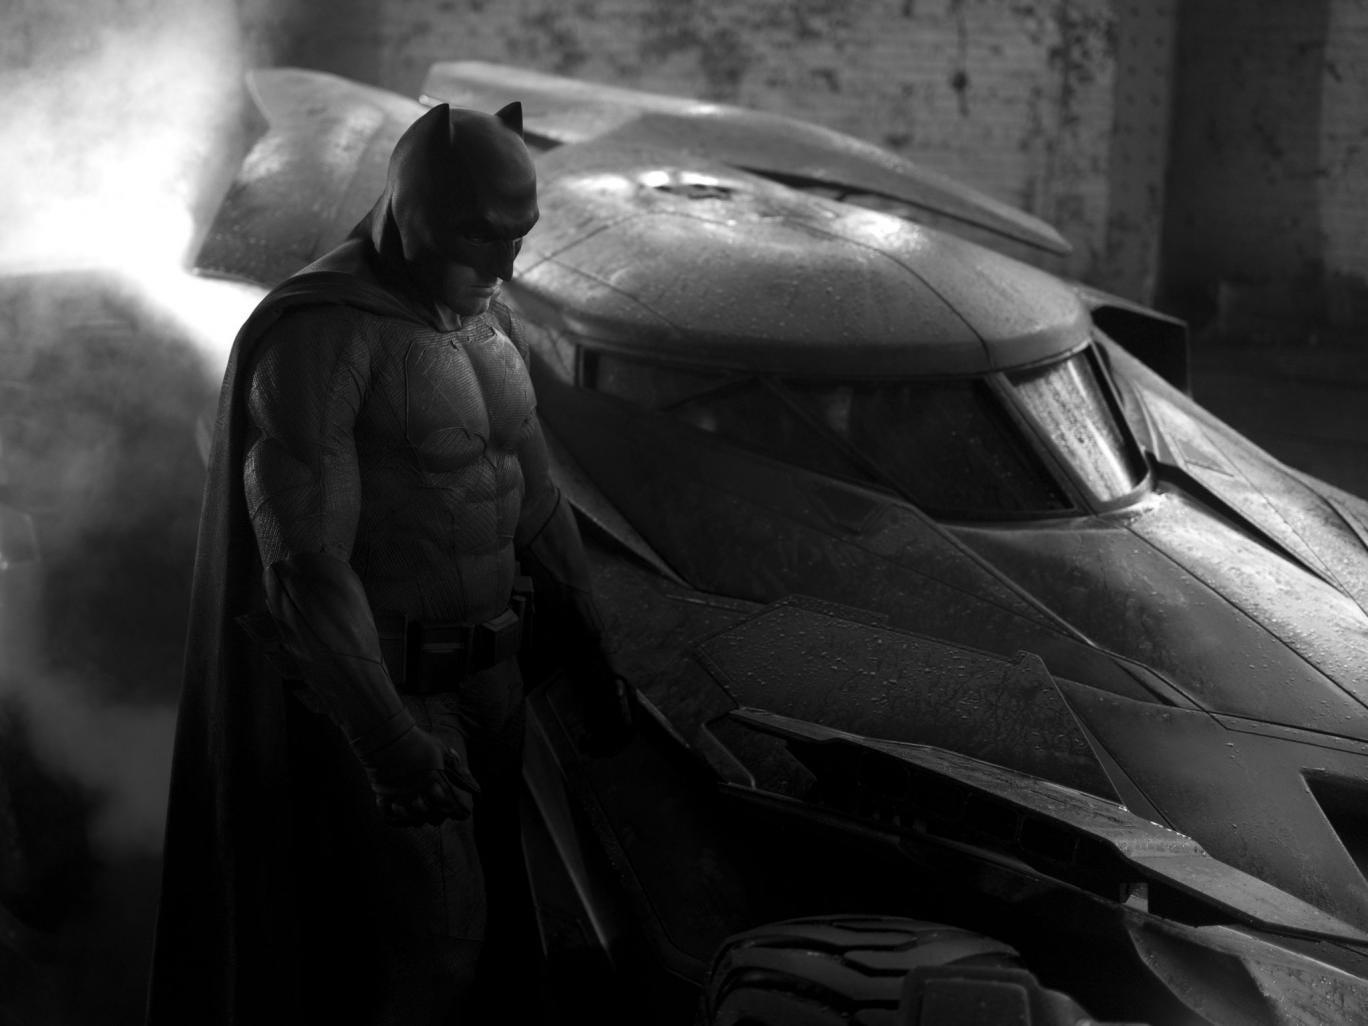 Ben Affleck as Batman with the batmobile in a Batman vs Superman teaser photo